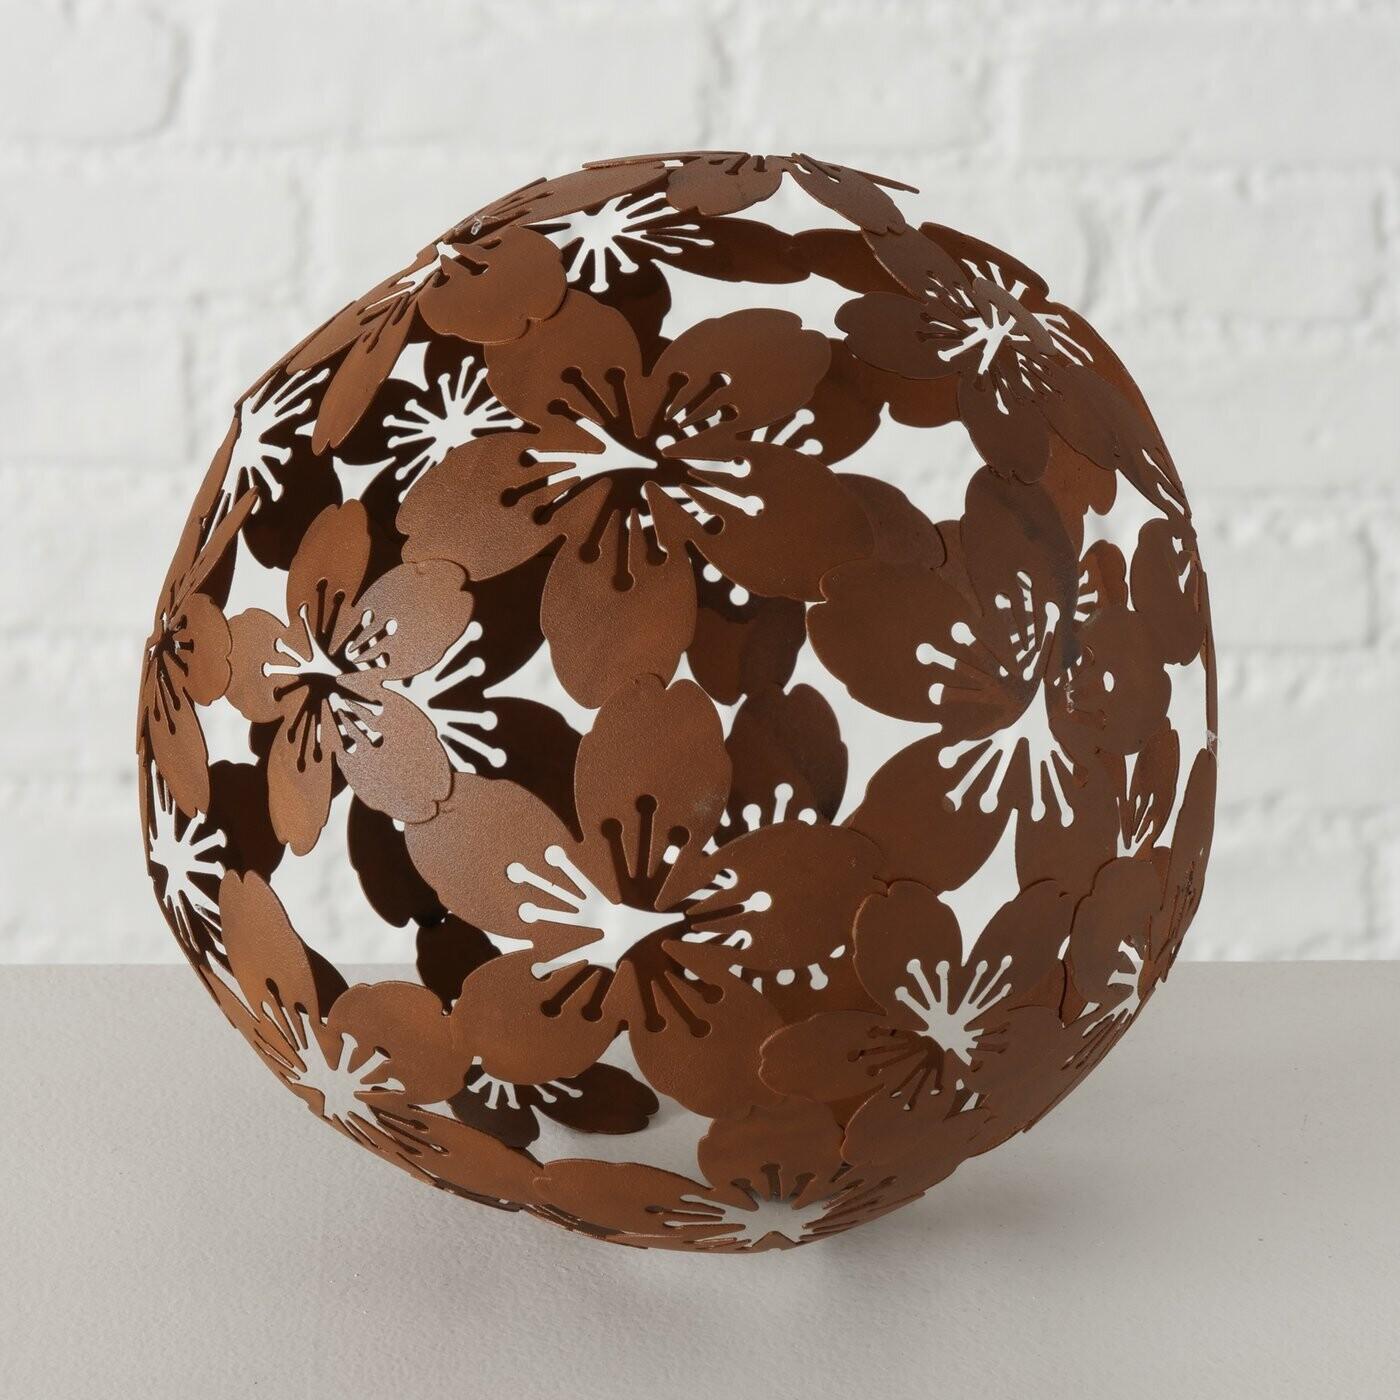 Deco bal roest Bloem Klein